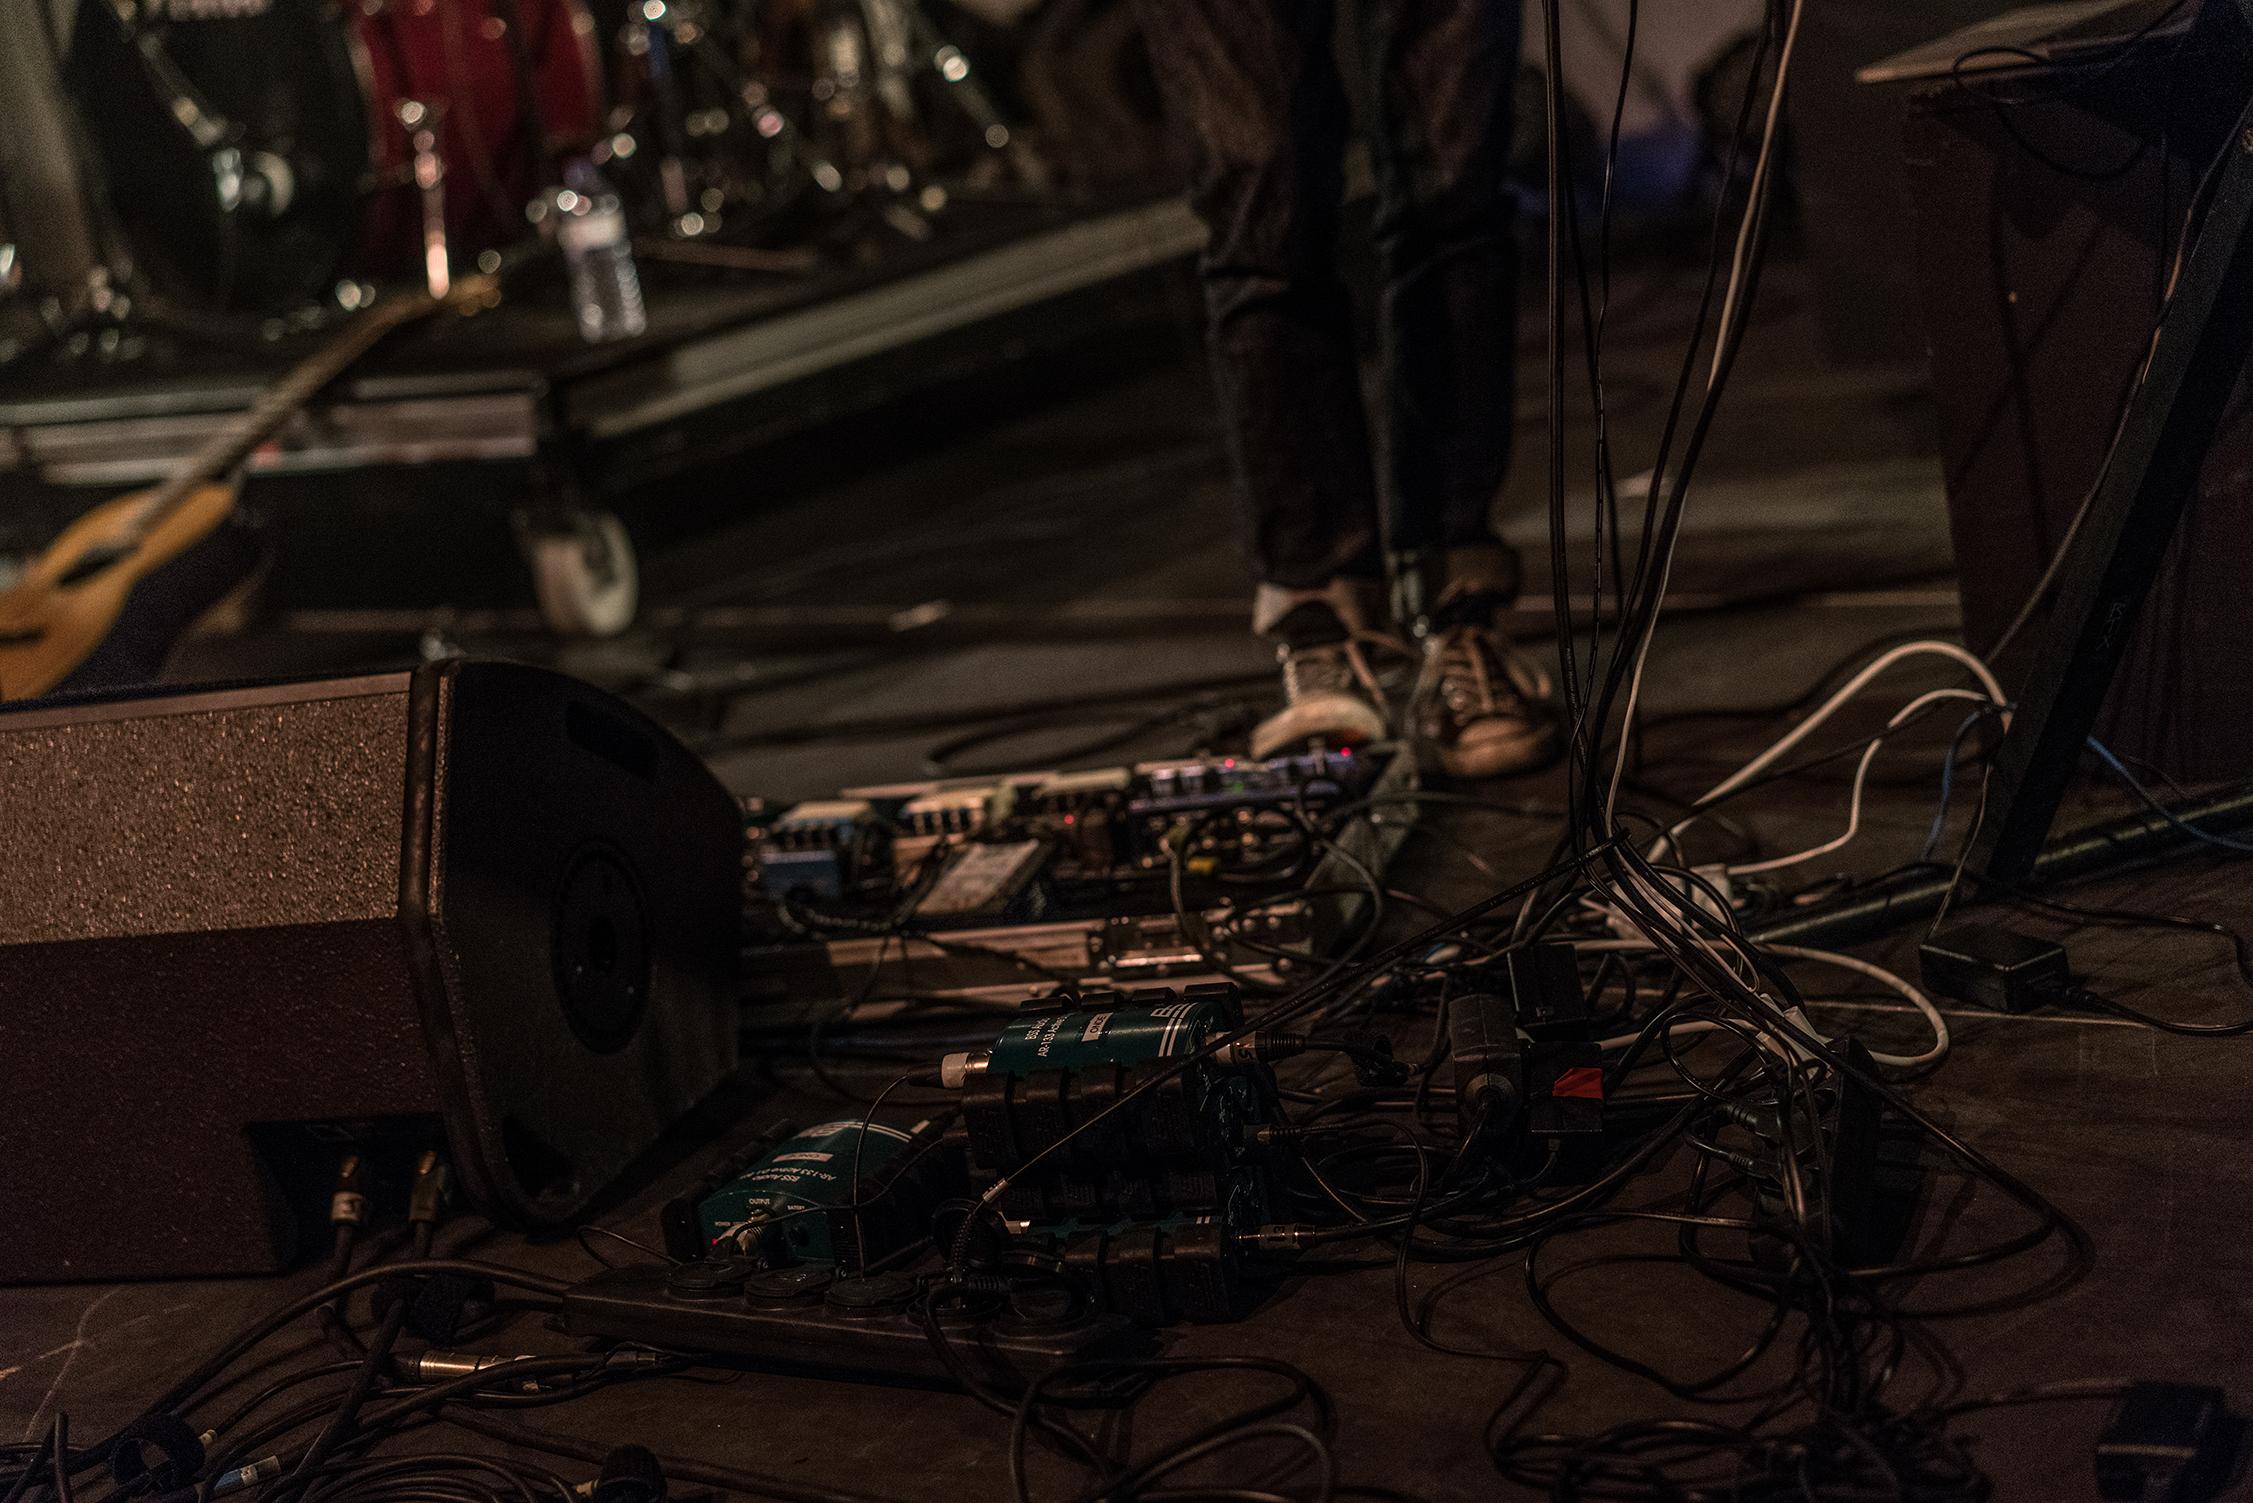 electrochic festival 2 mars 2017 photos @alexisjacq1-02592_web.jpg